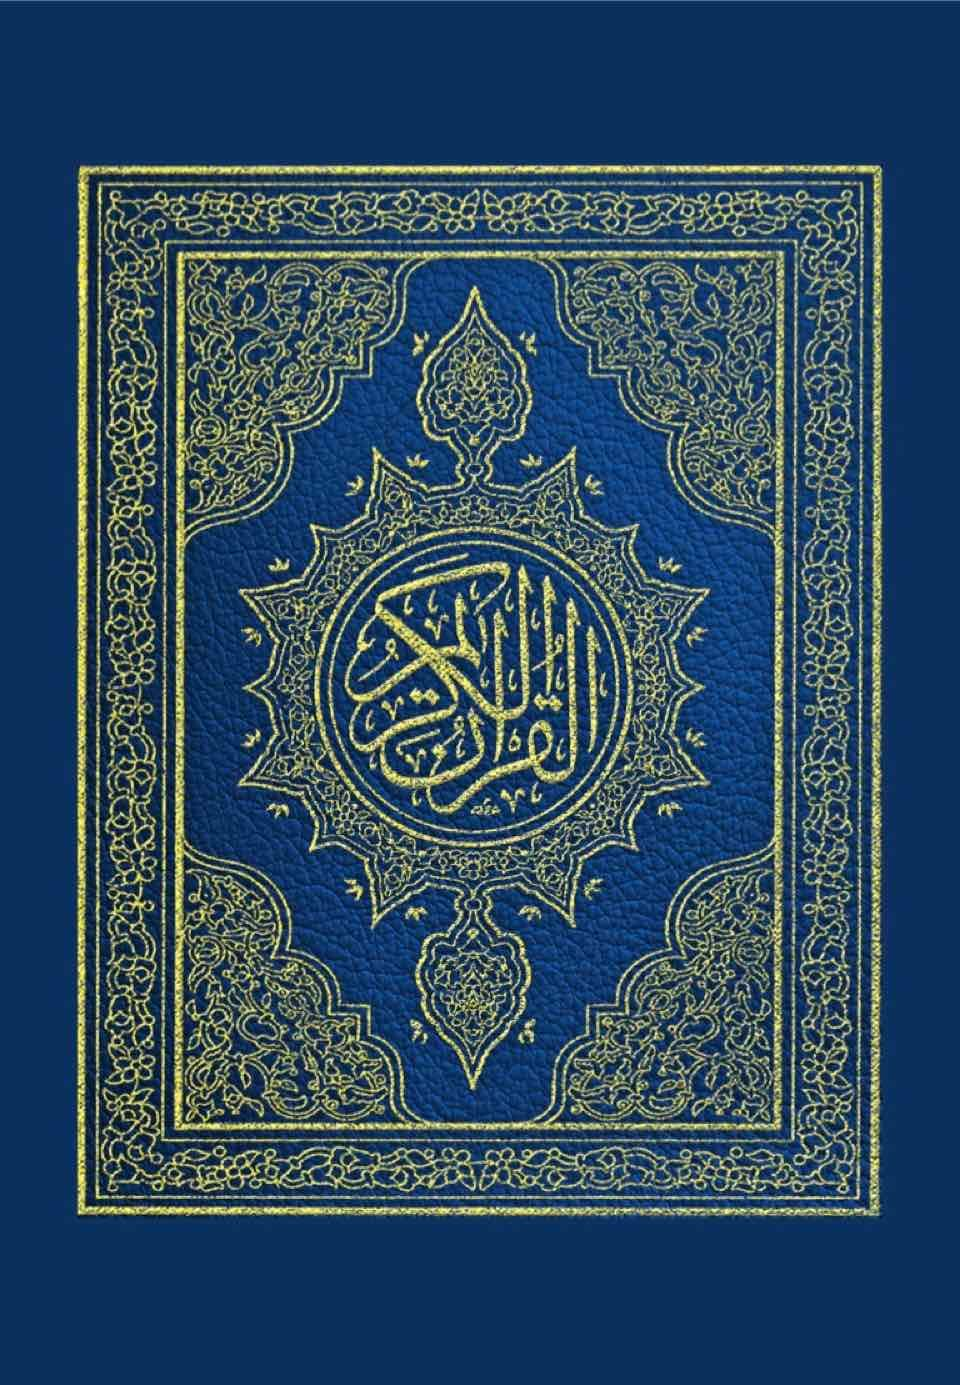 eSahifa com | Online Books for Dawoodi Bohra Mumineen | quran